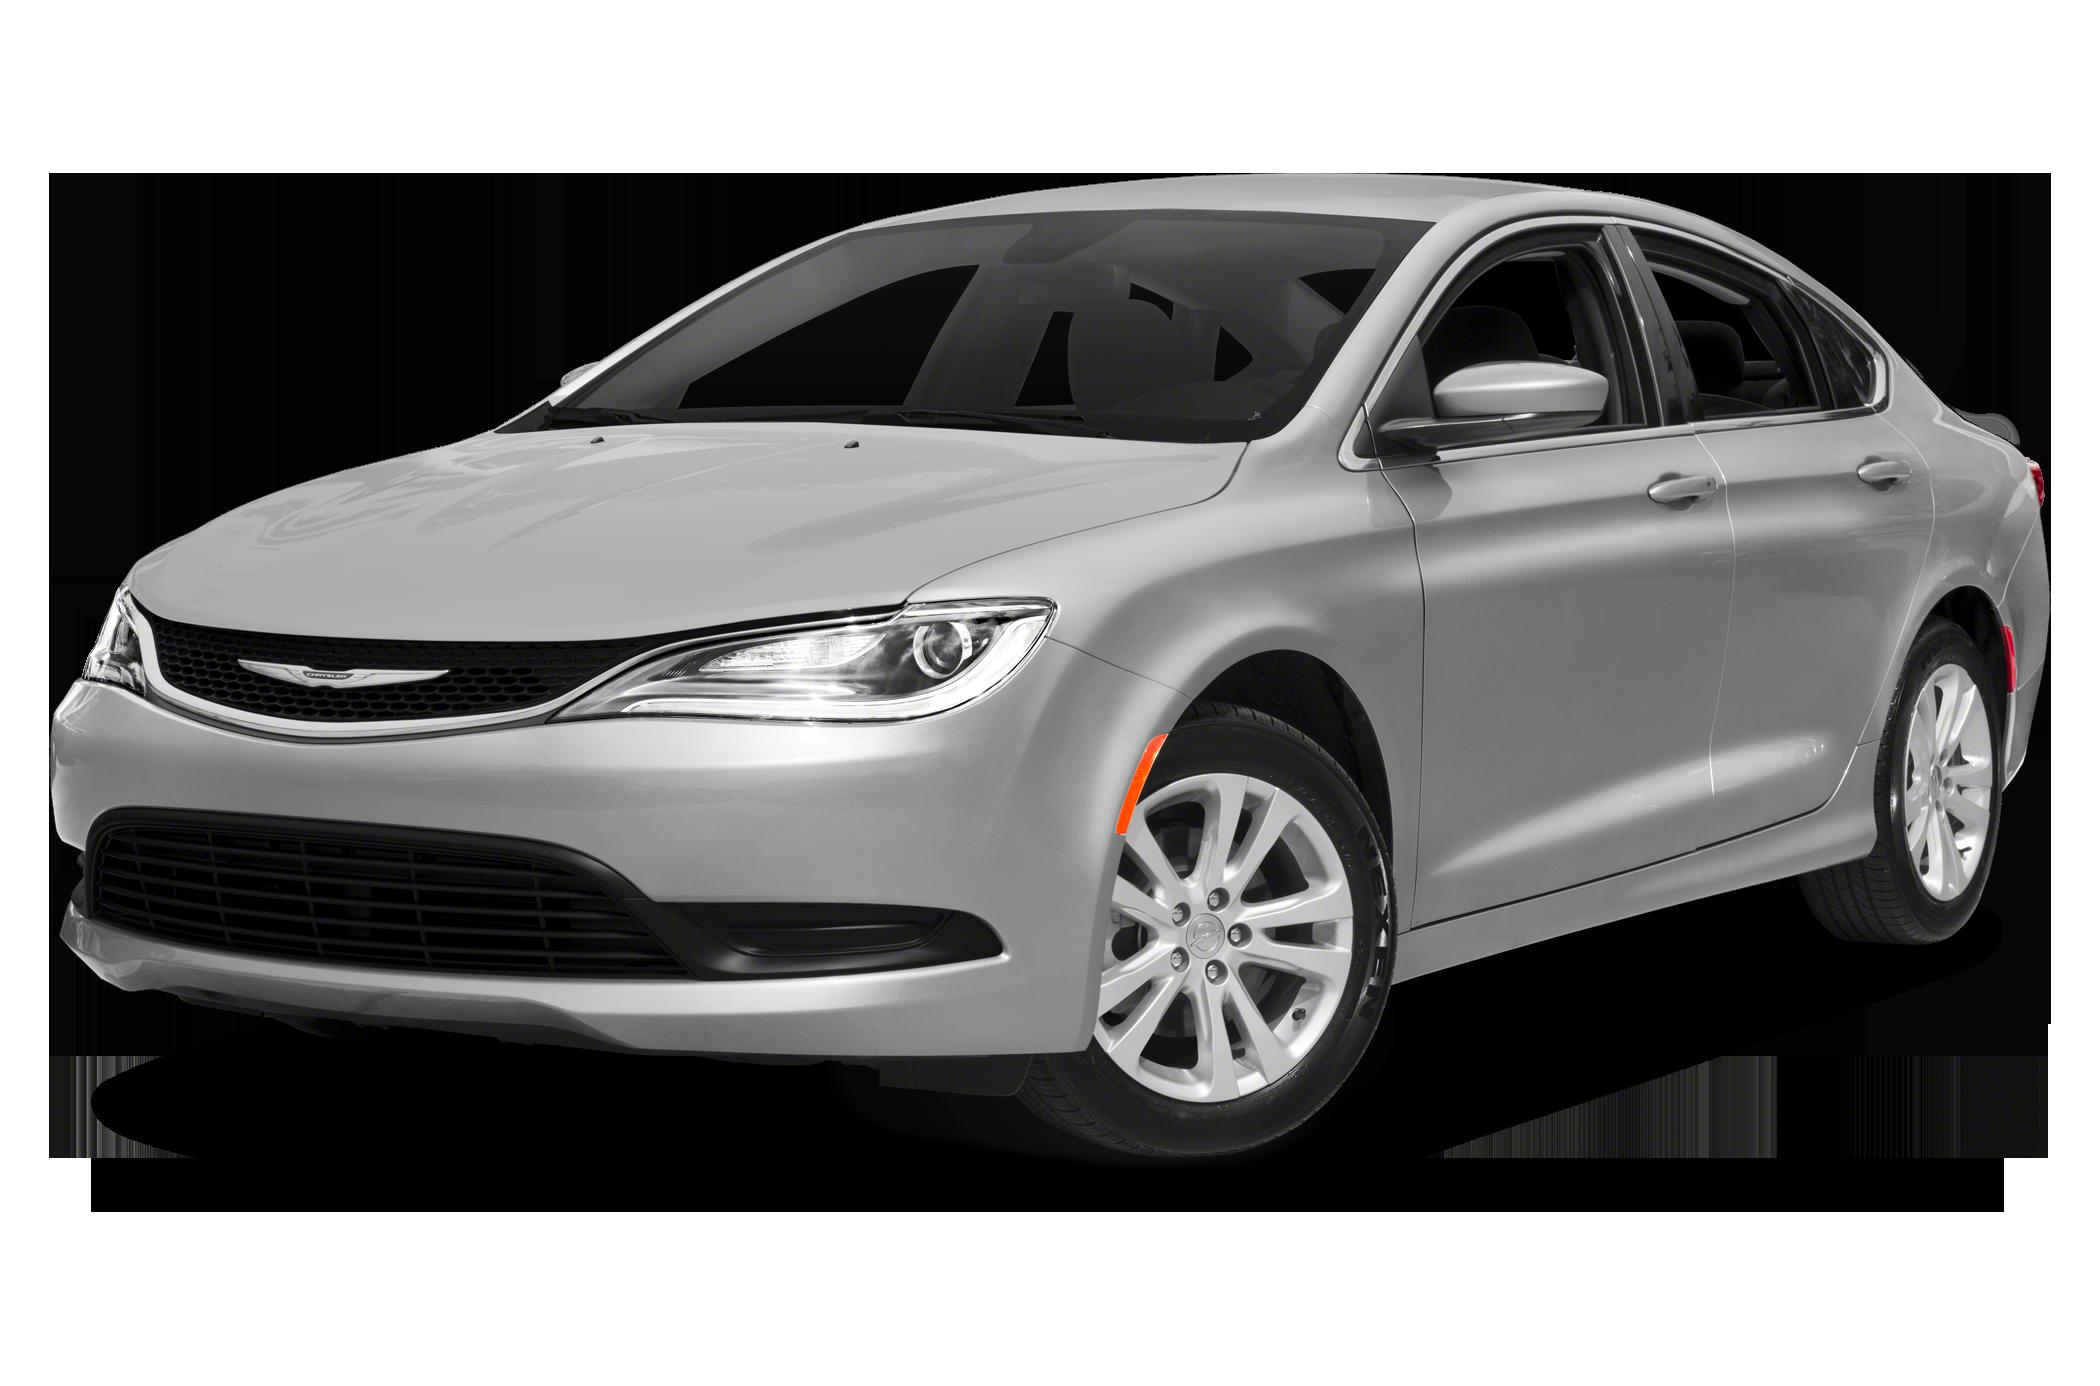 pare Chrysler 200 to Chevrolet Malibu